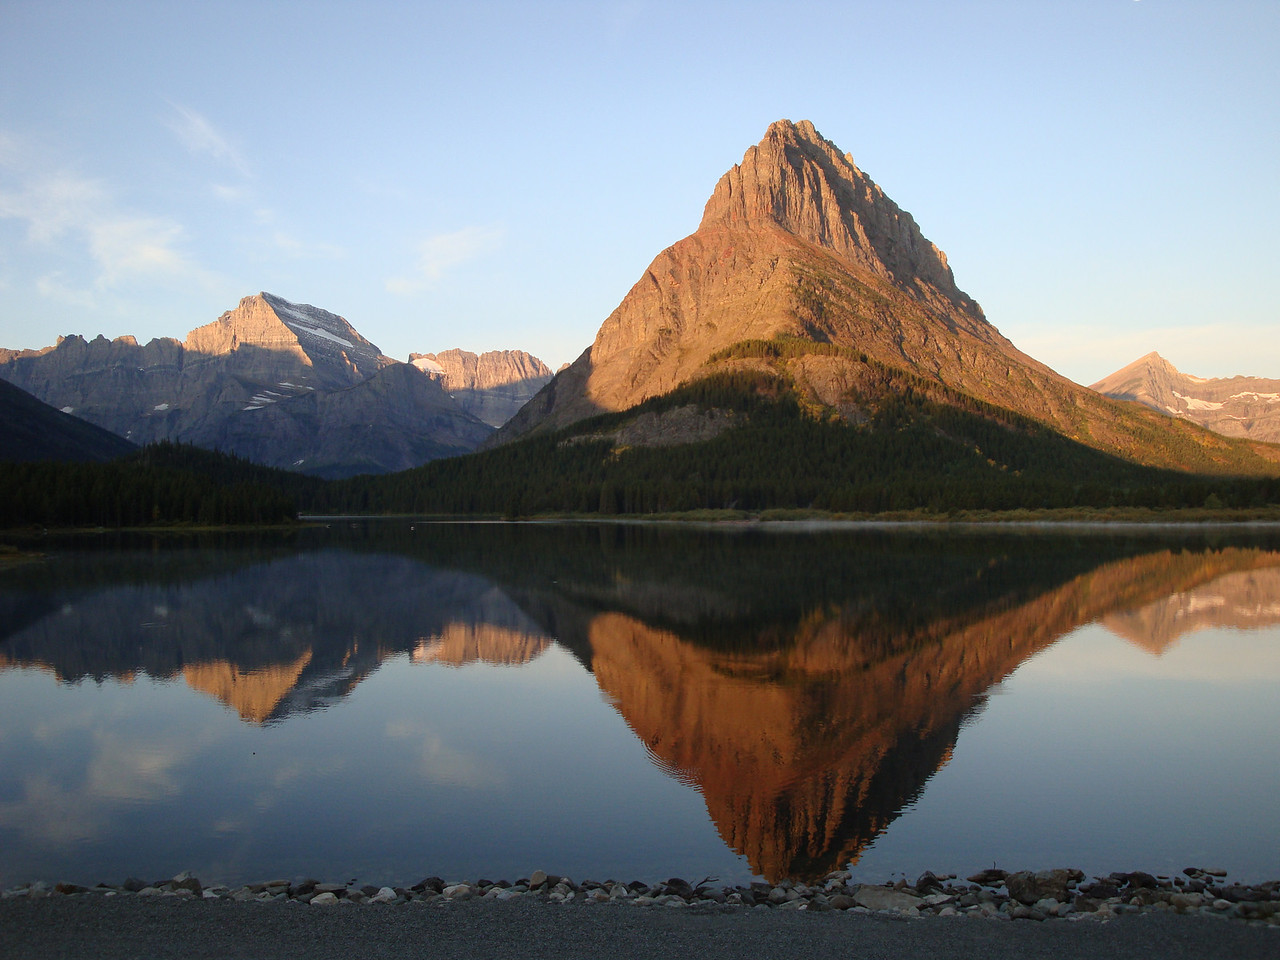 Sunrise at Many Glaciers